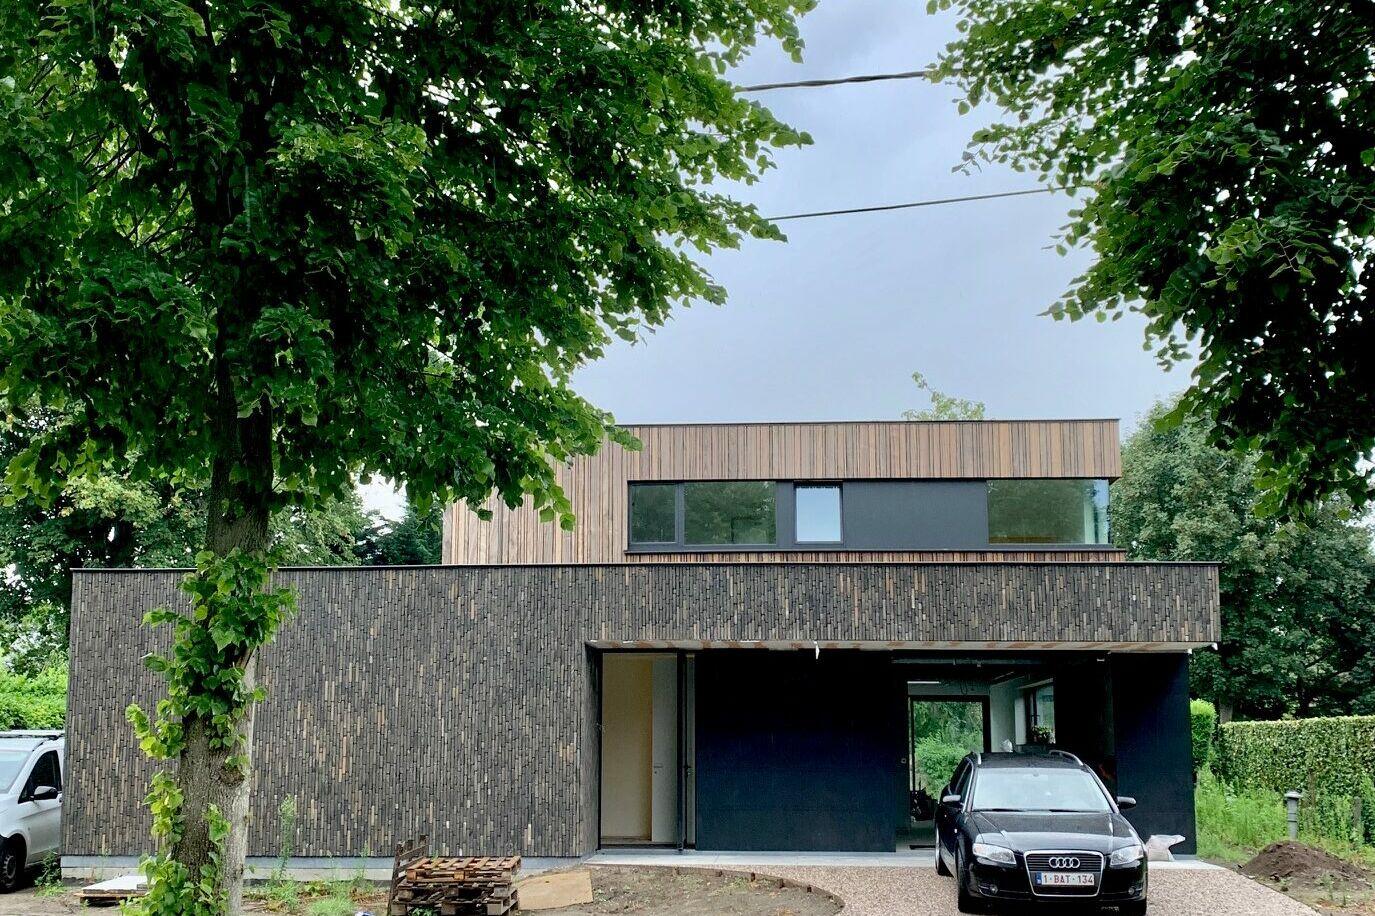 Unknown 2 e1609410983511 uai | Baeyens & Beck architecten Gent | architect nieuwbouw renovatie interieur | high end | architectenbureau